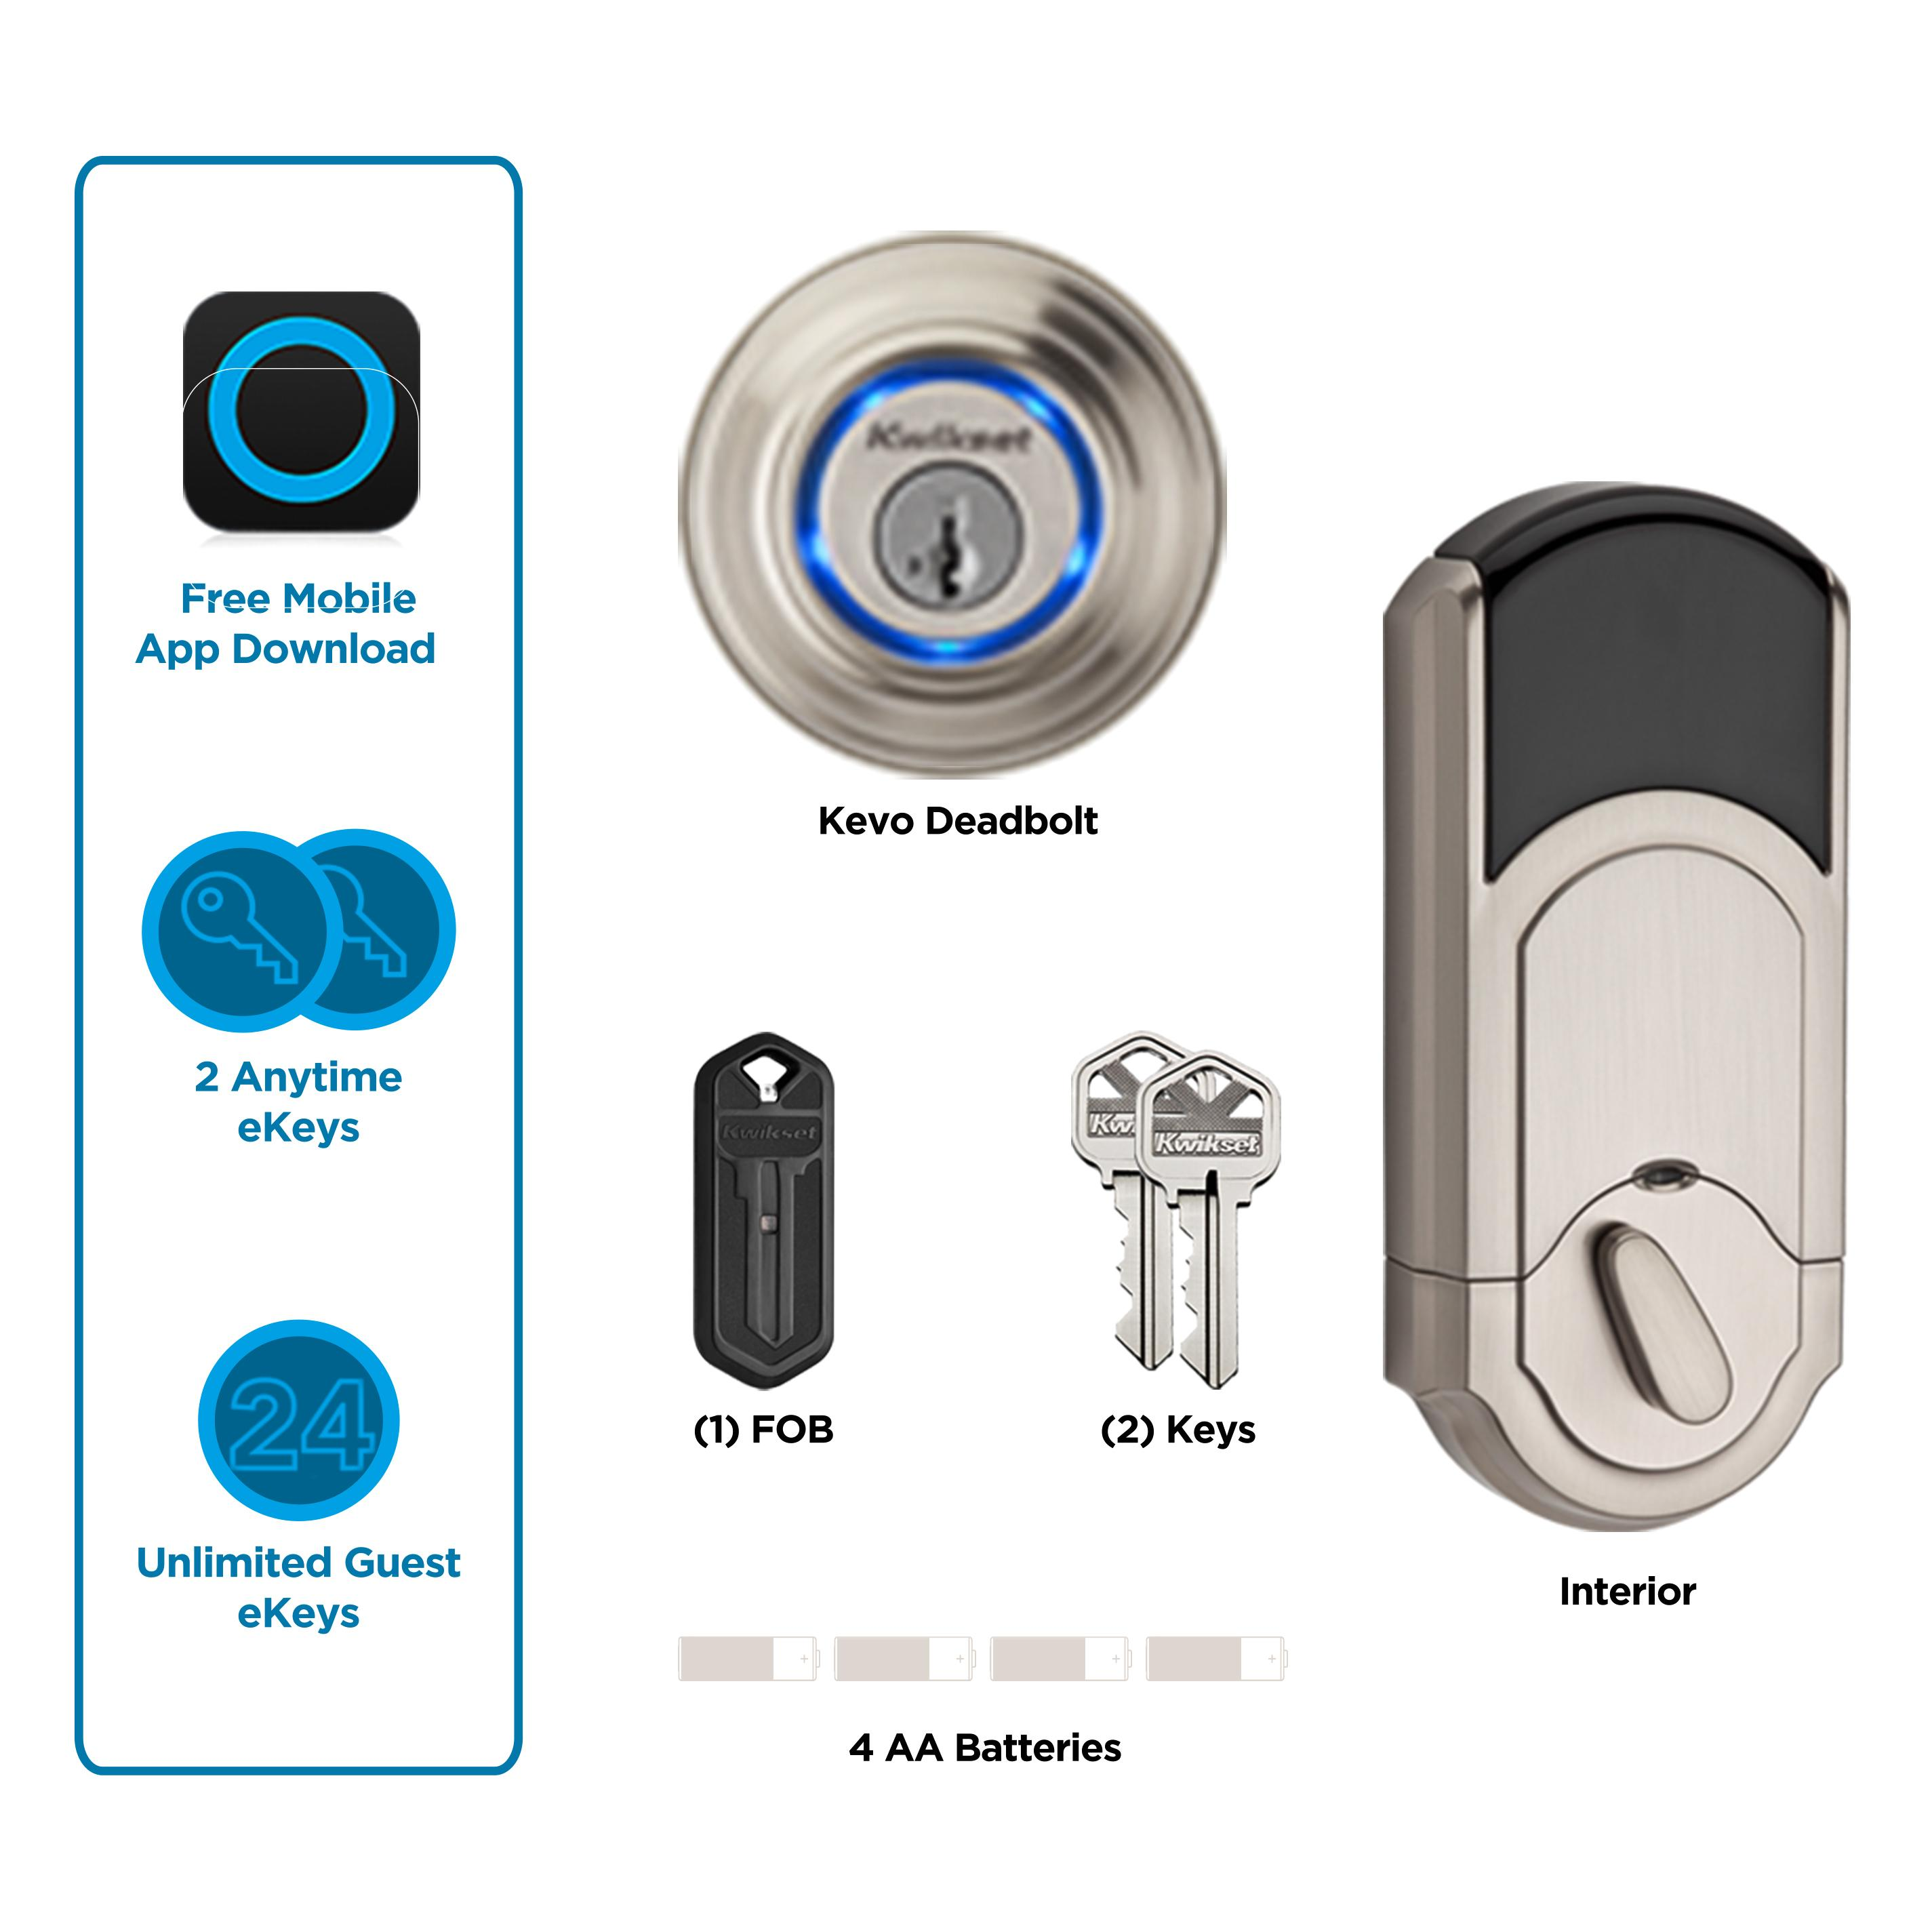 Kwikset Kevo 1st Gen Smart Lock With Keyless Bluetooth Touch To Open Convenience Certified